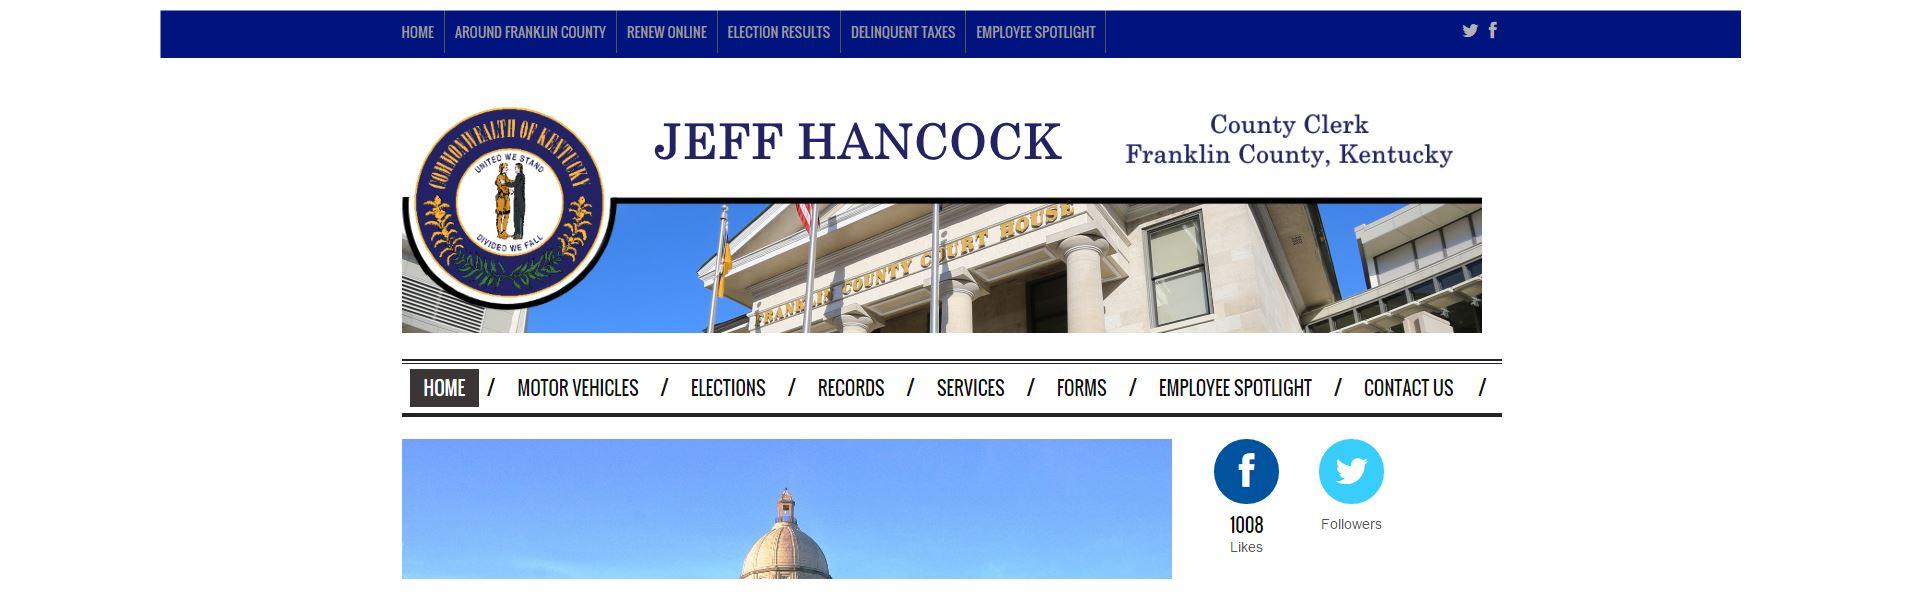 featured-website